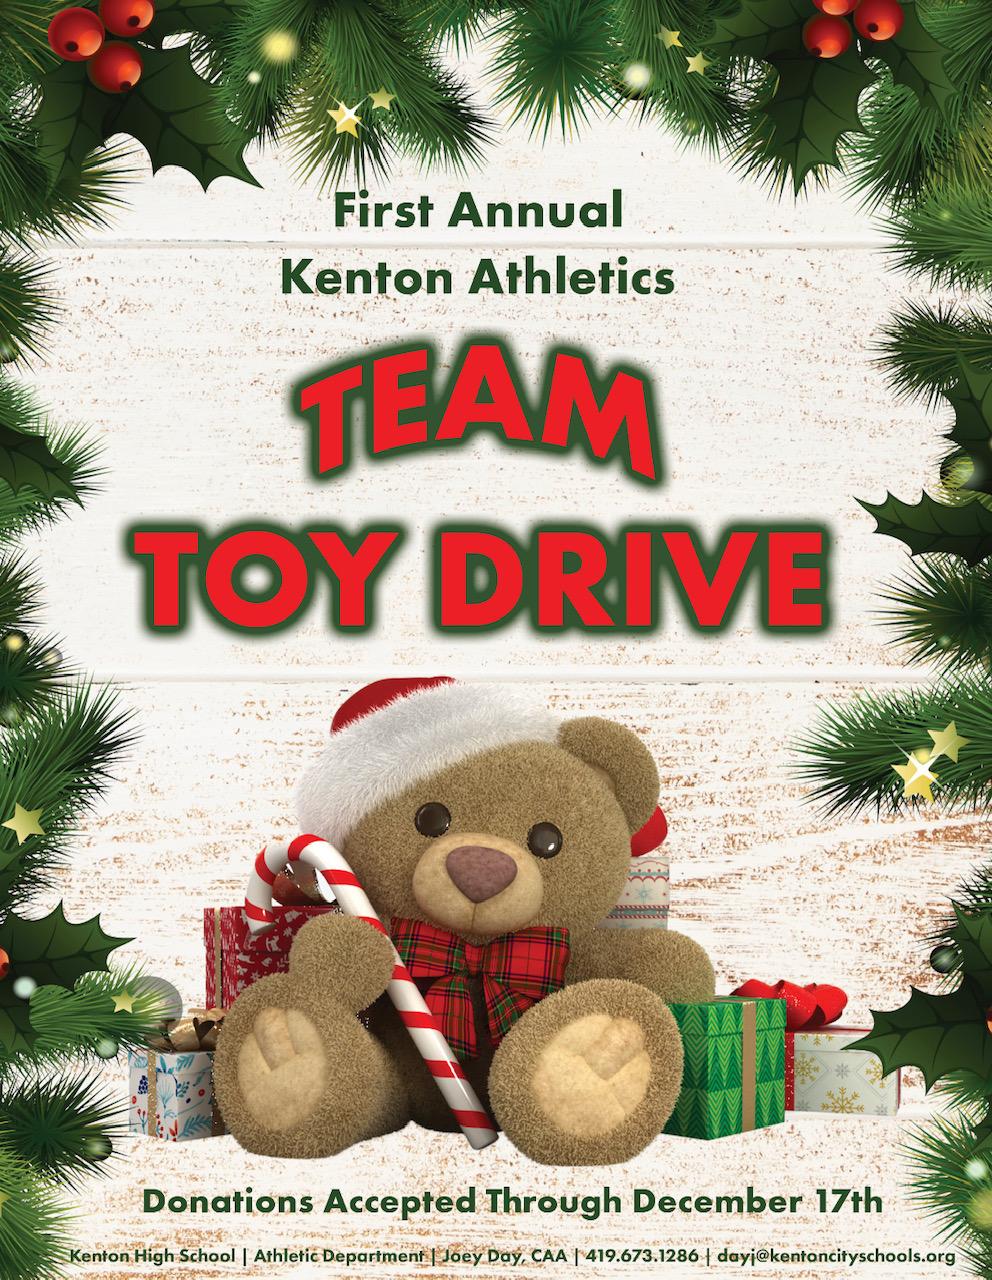 1st Annual Kenton Athletics Team Toy Drive